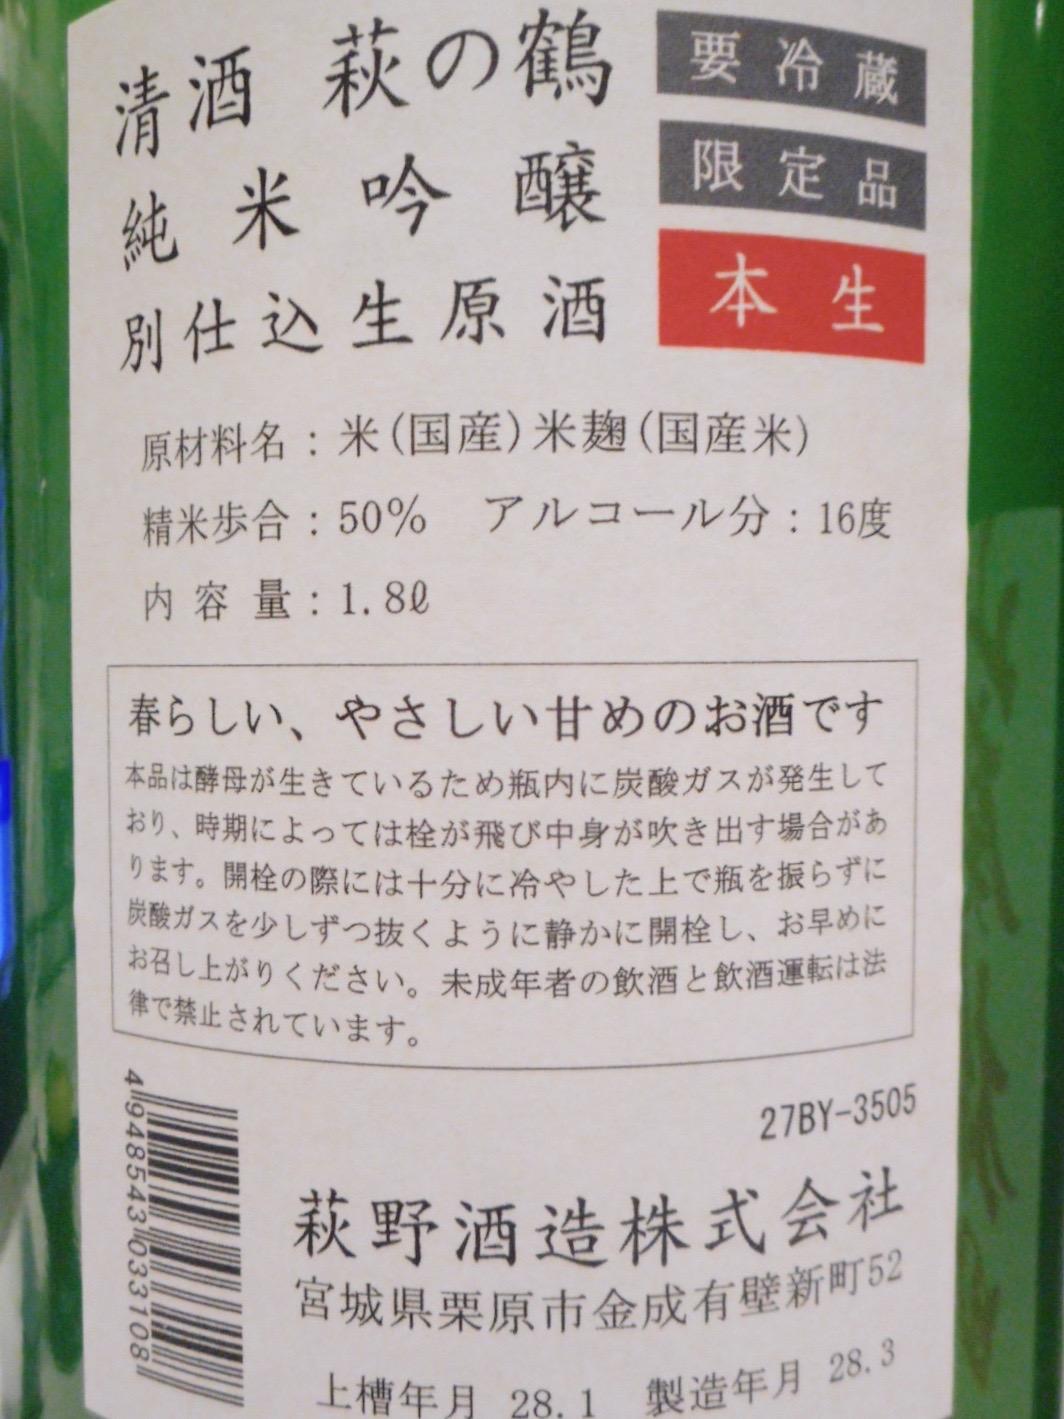 haginoturu_neko_sakura2.jpg